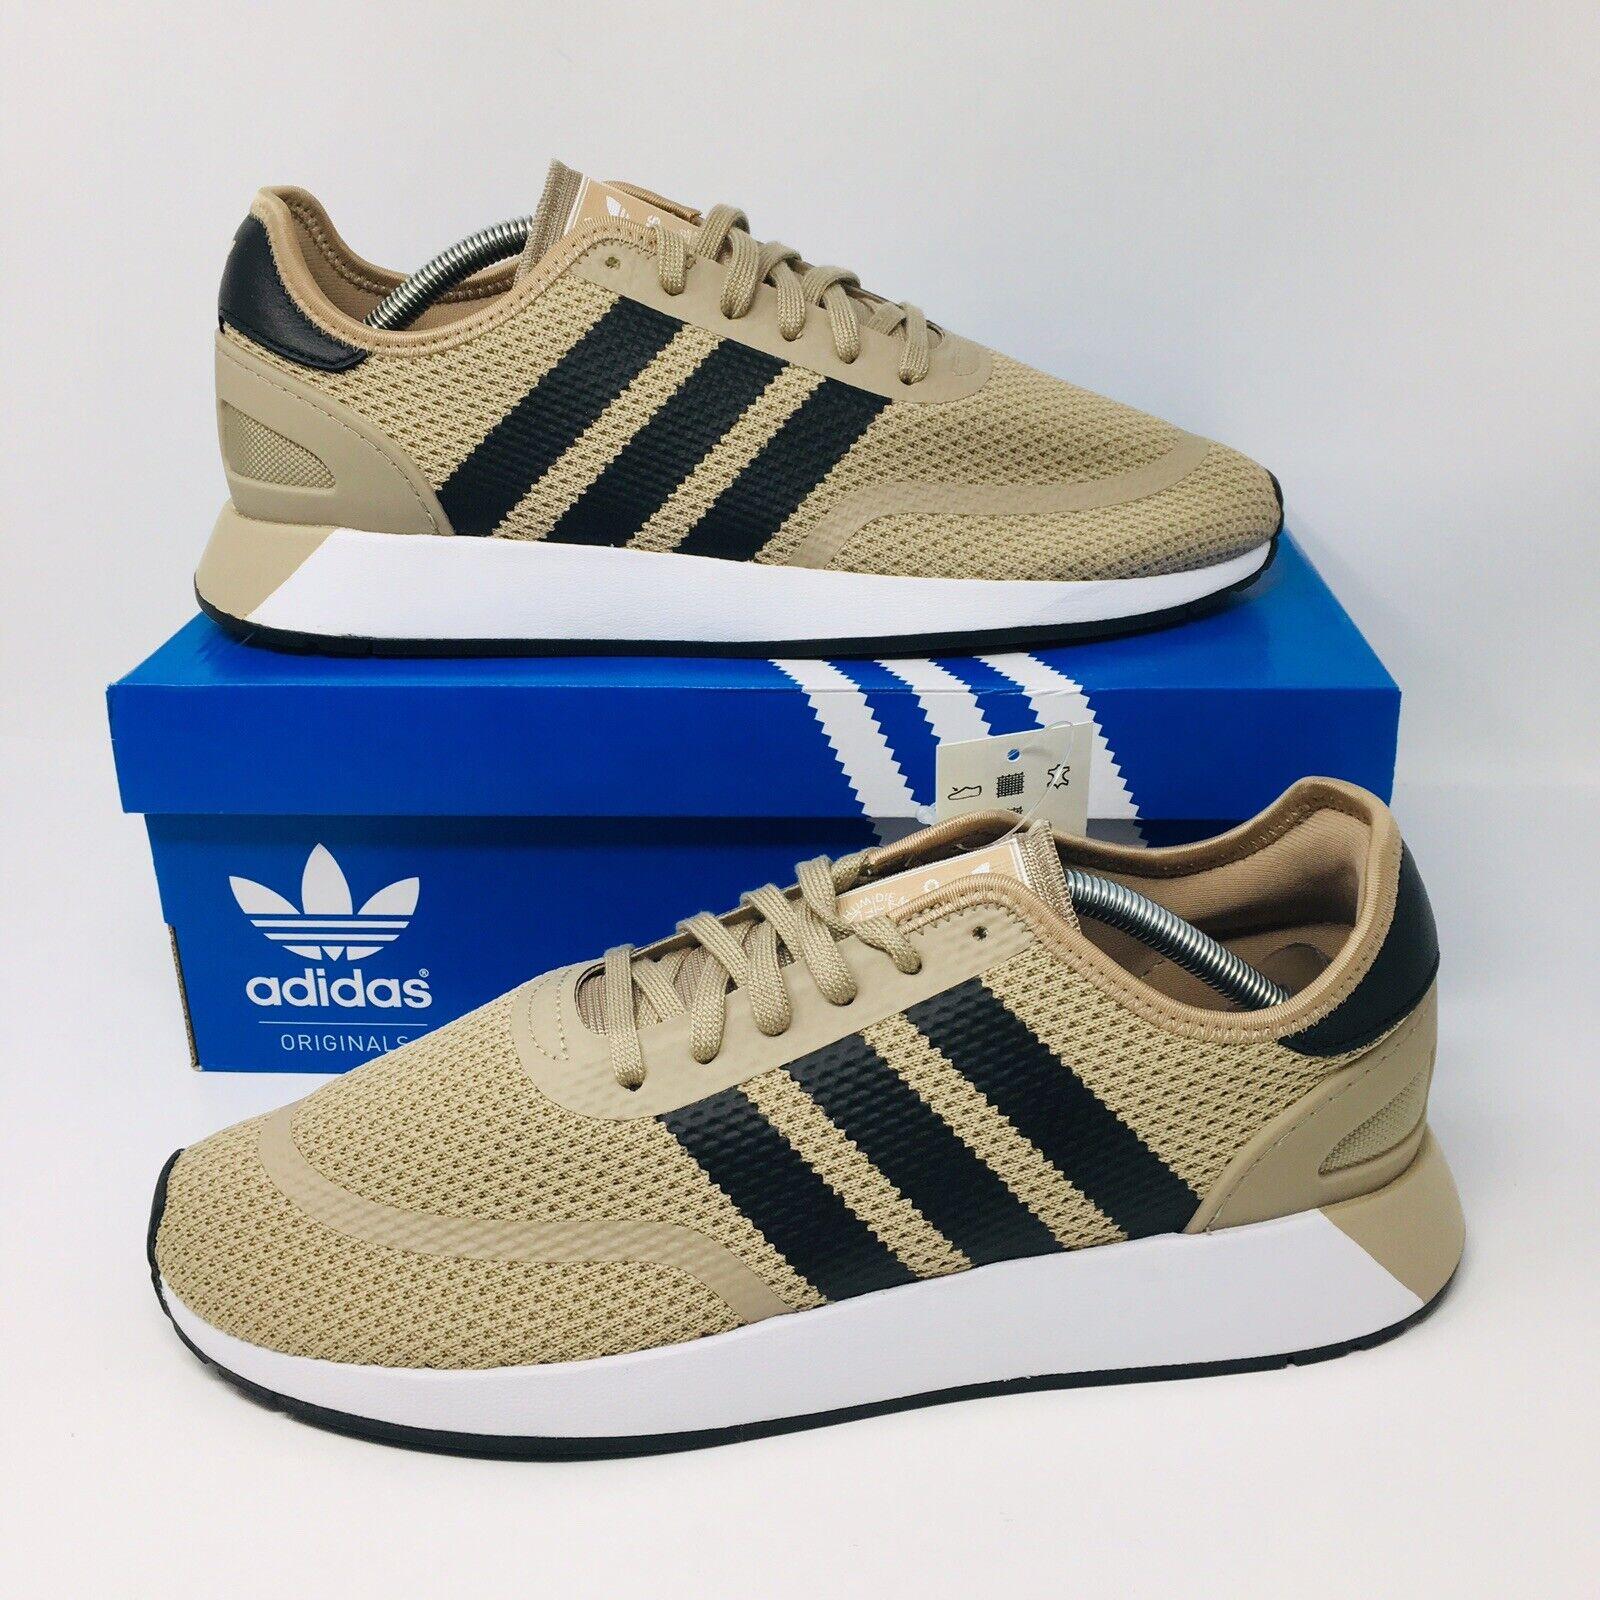 NEW Adidas Original N-5923 NMD (Men Size 11) Tan Running shoes